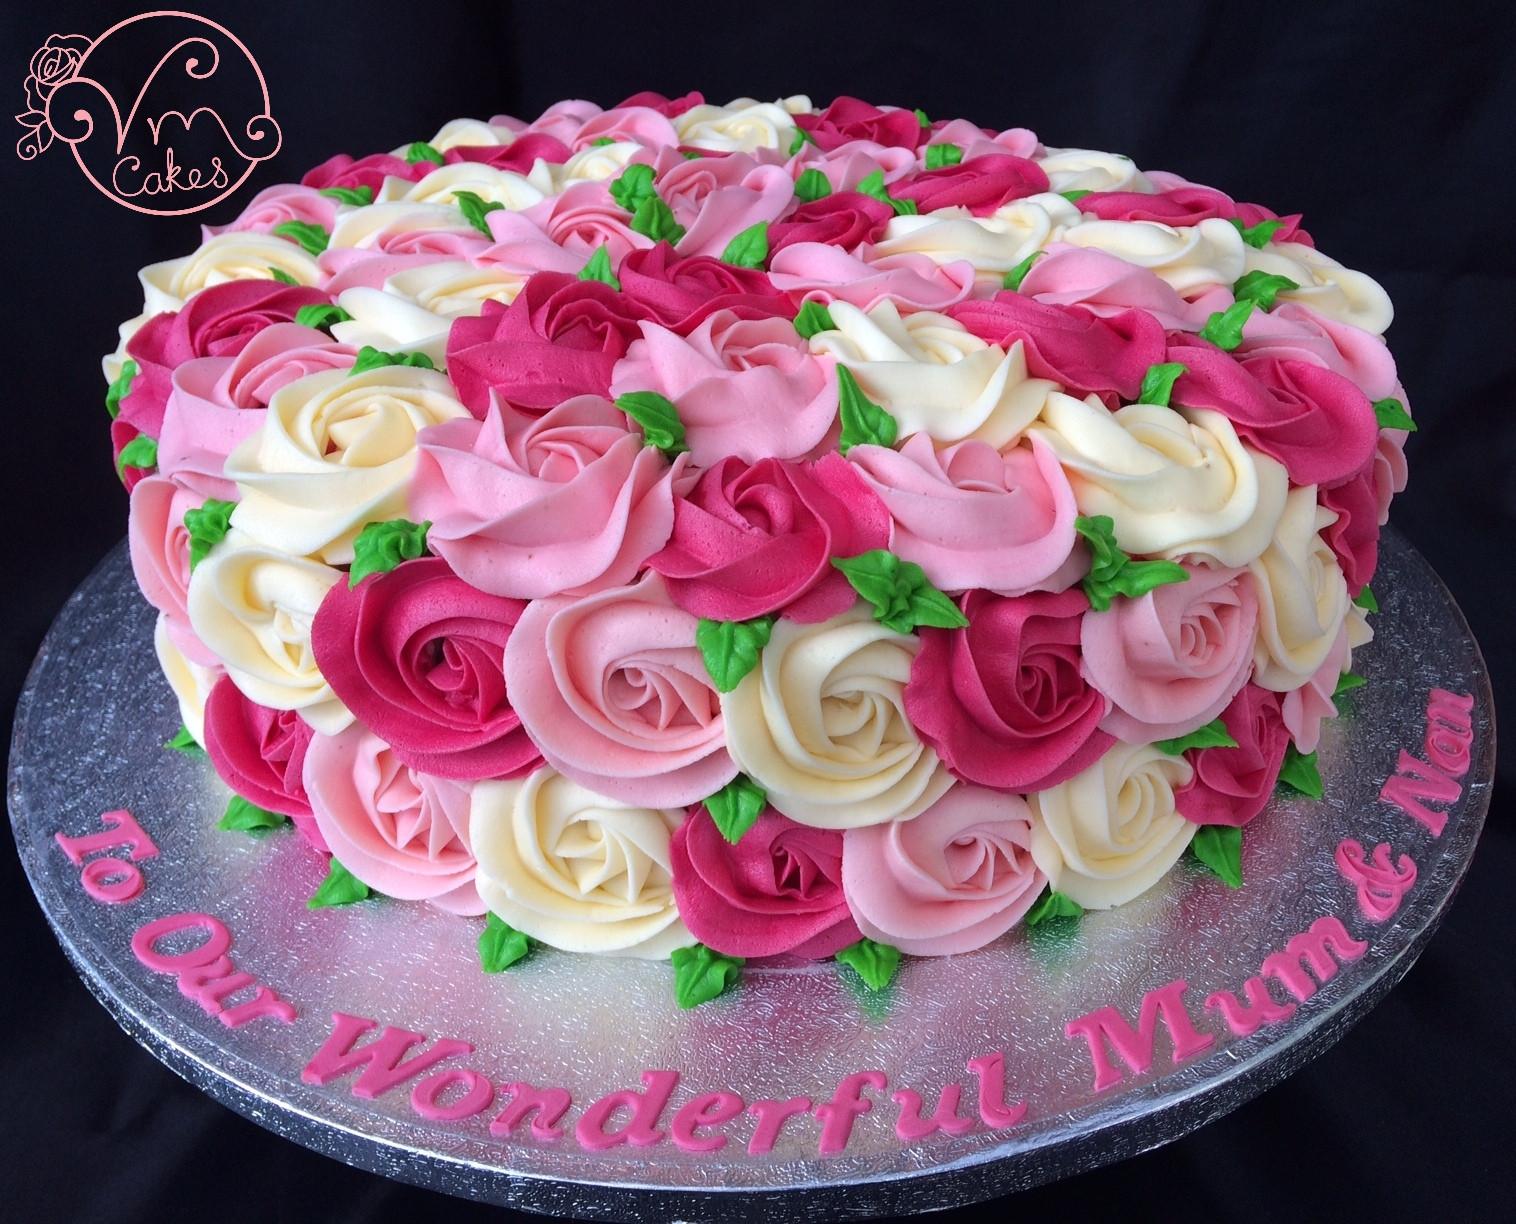 VM Cakes | Wedding & Celebratory Cakes in Norwich